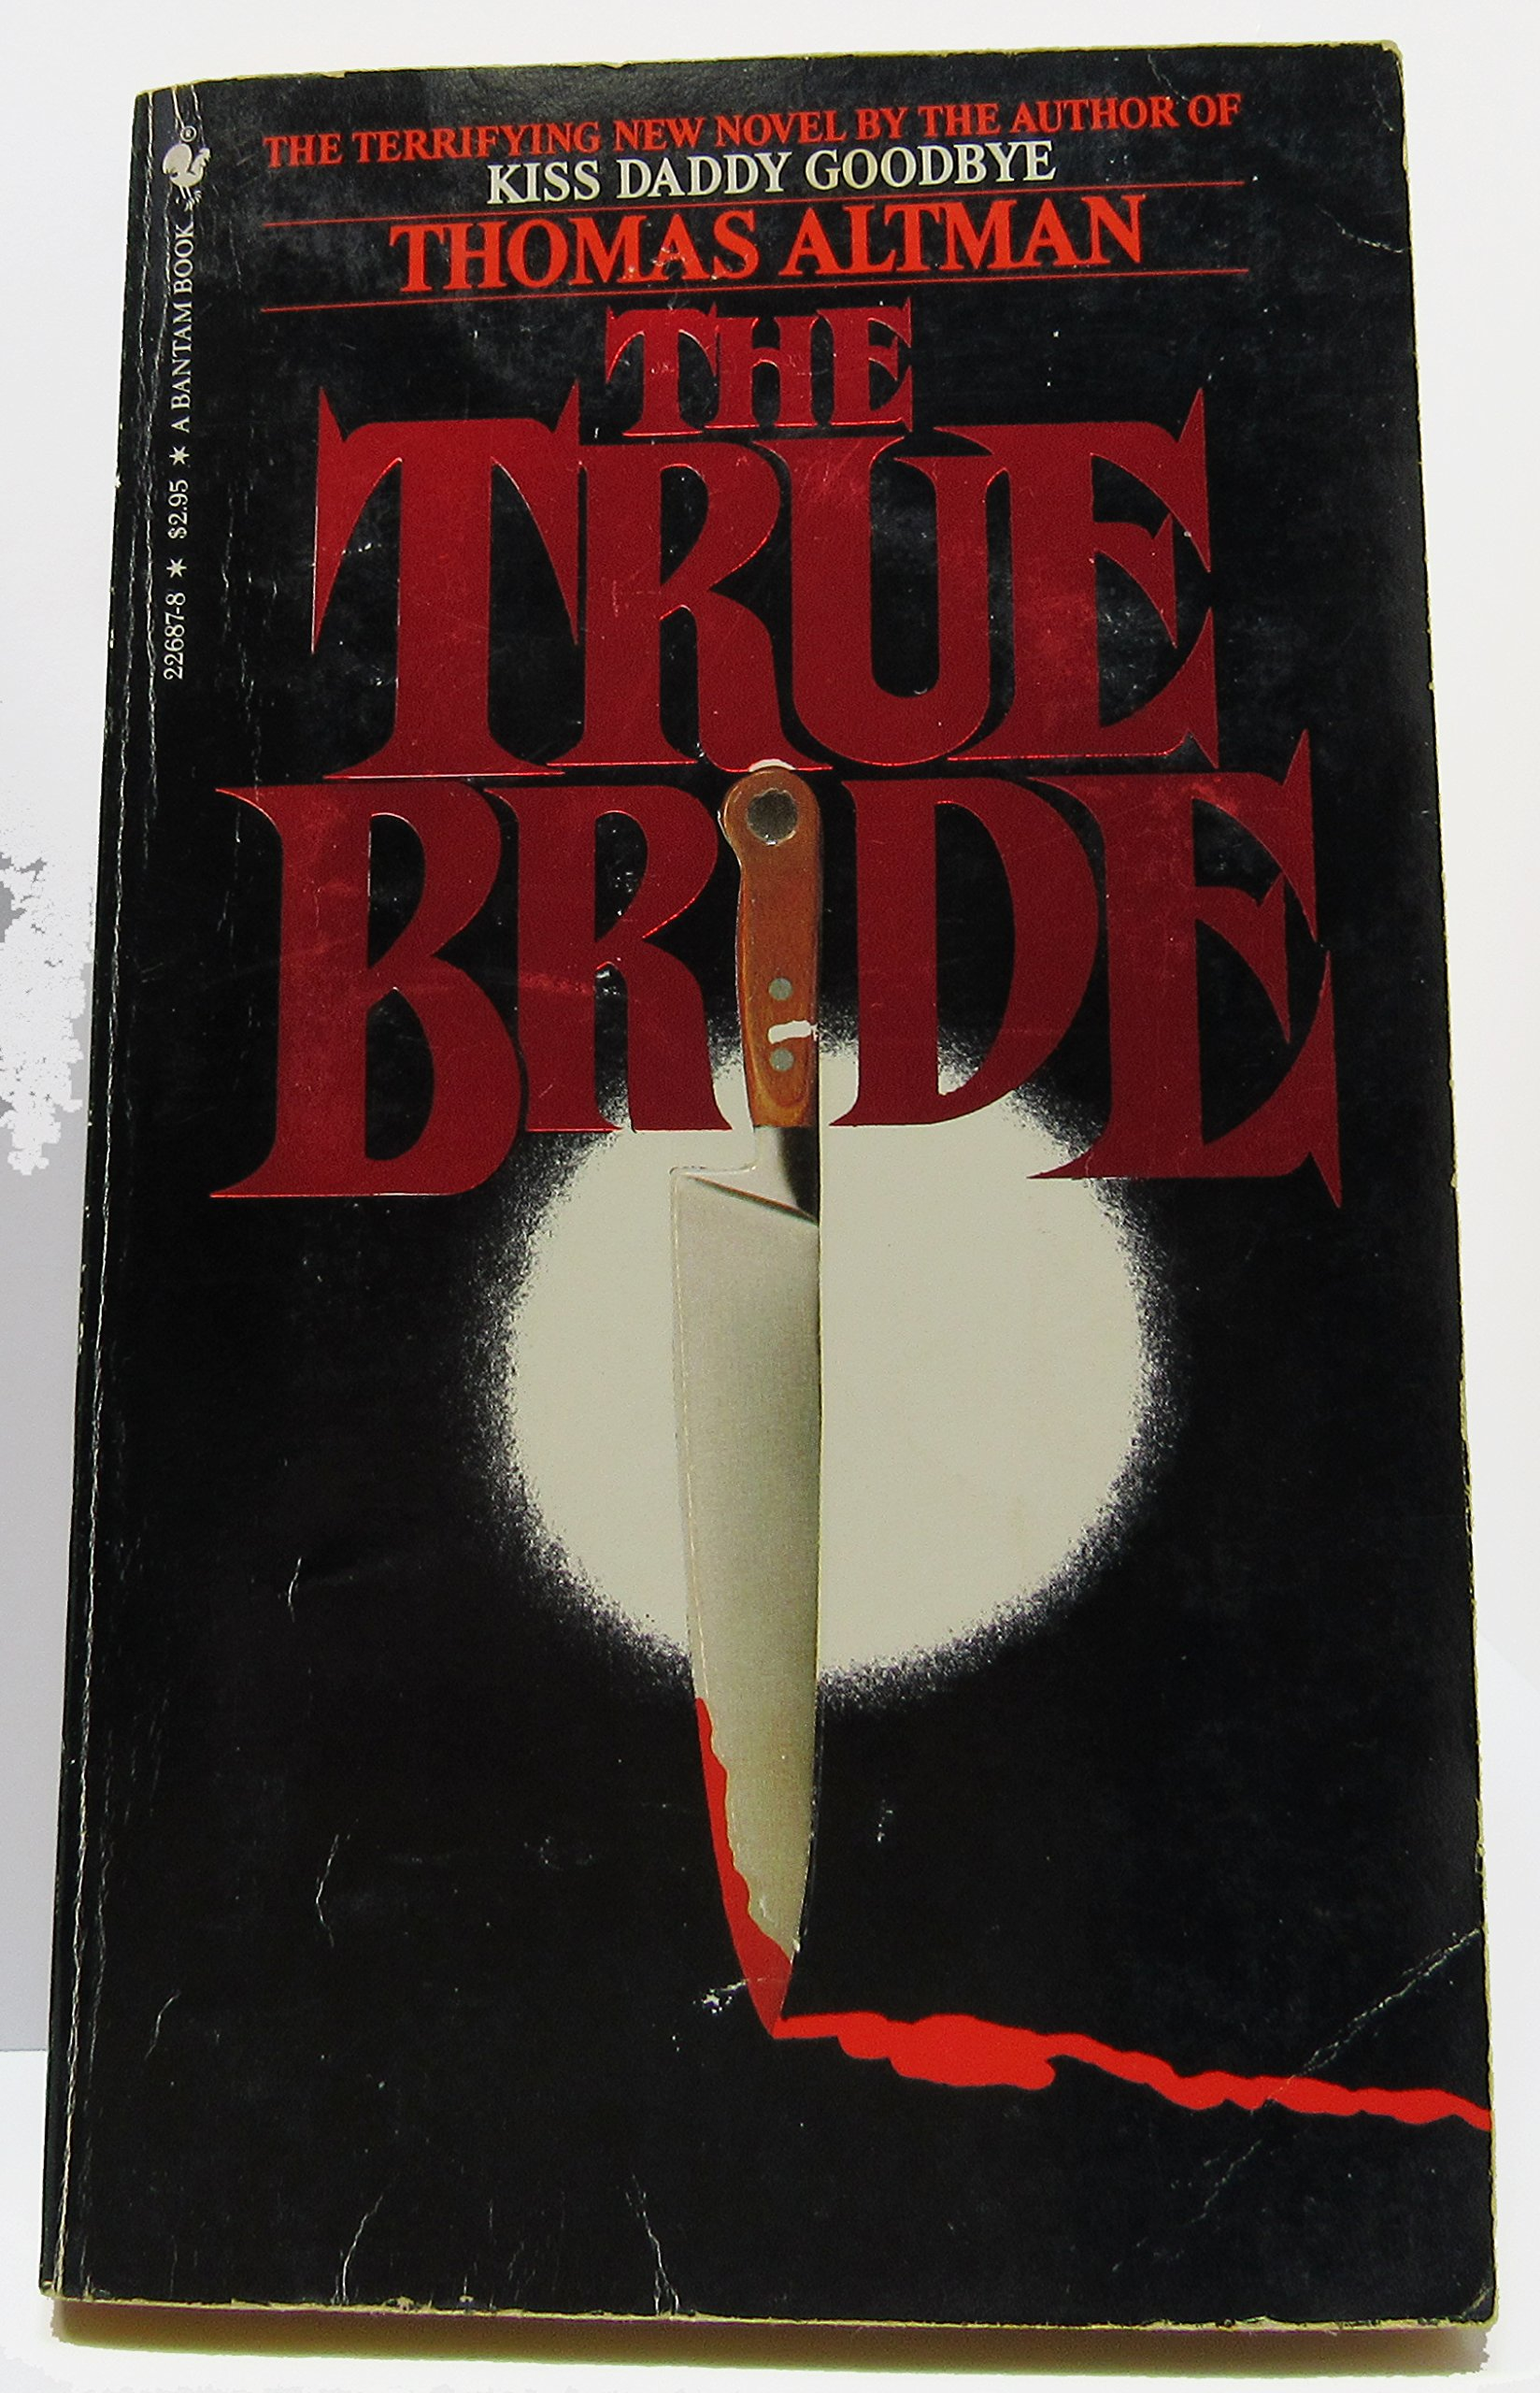 The True Bride: Thomas Altman: 9780553226874: Amazon.com: Books